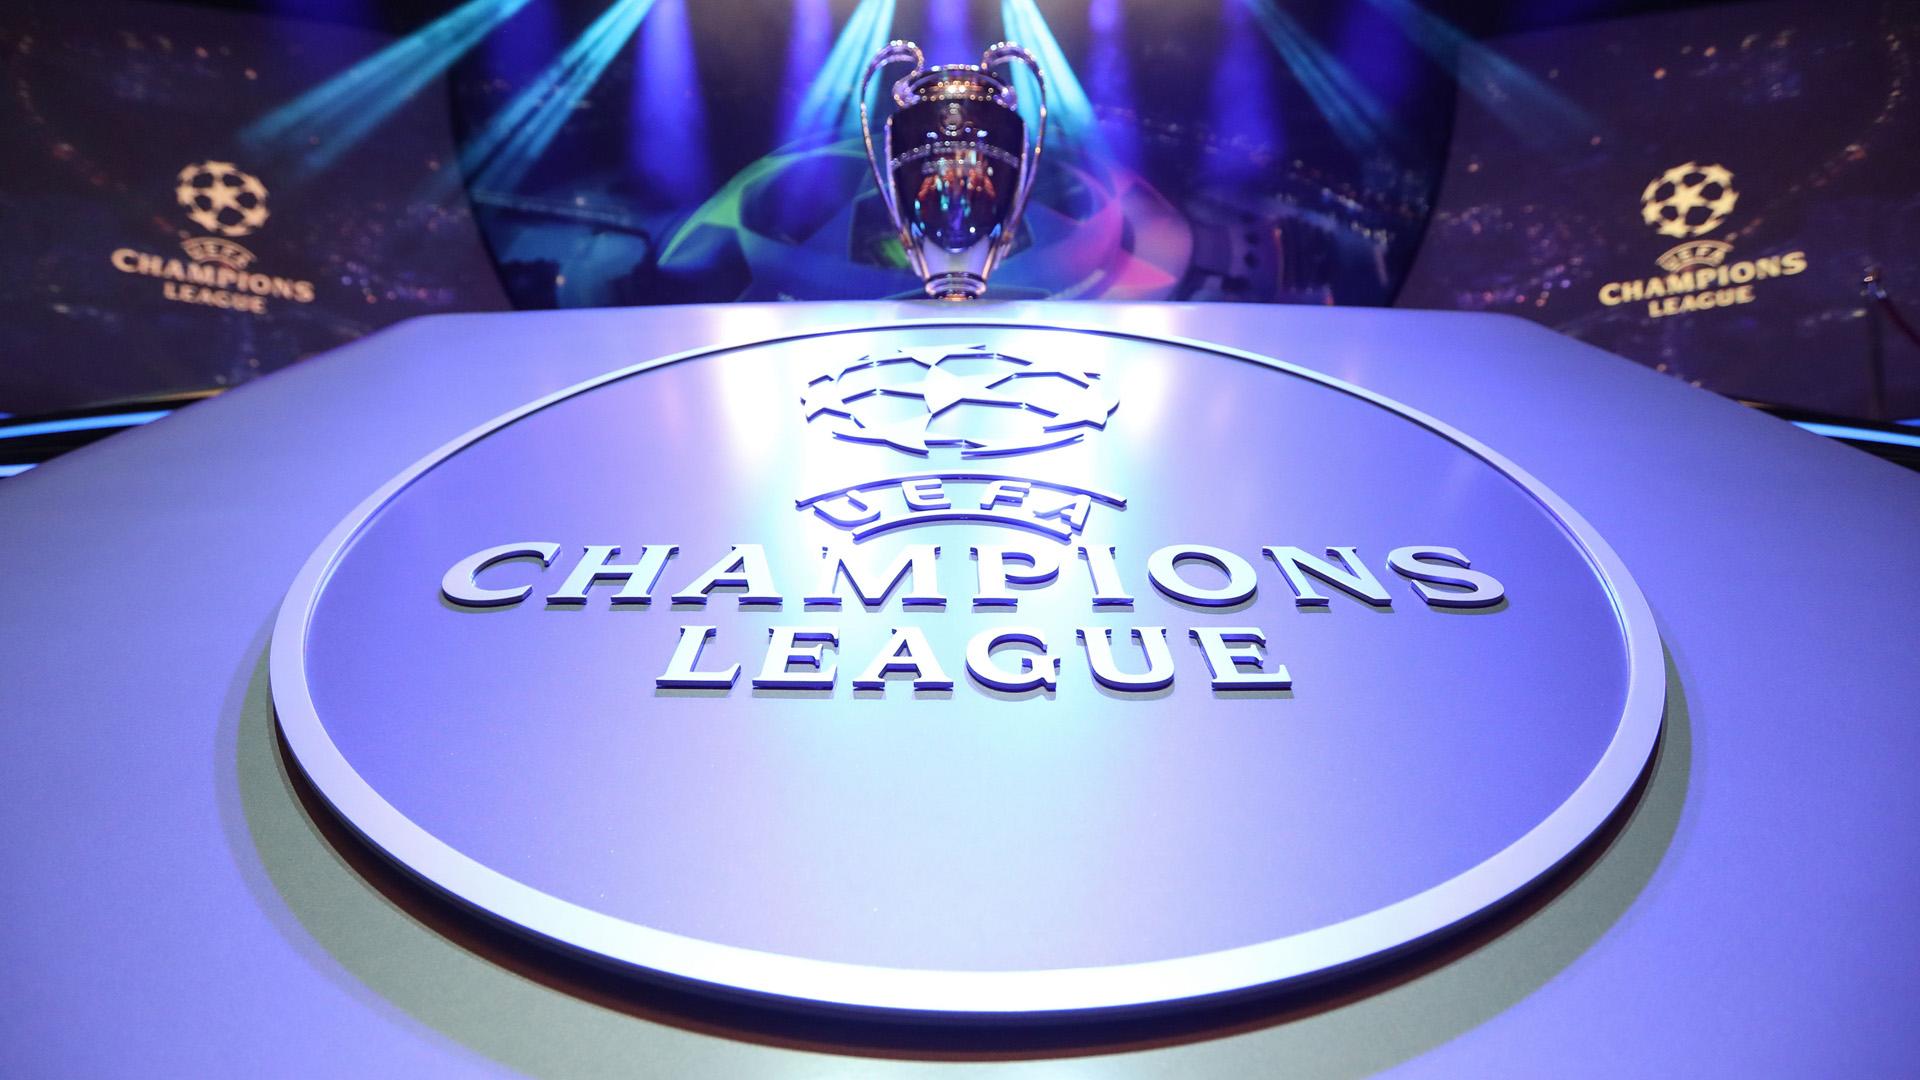 Champions League Calendario Completo.Gironi Champions League 2019 2020 Calendario Date E Orari